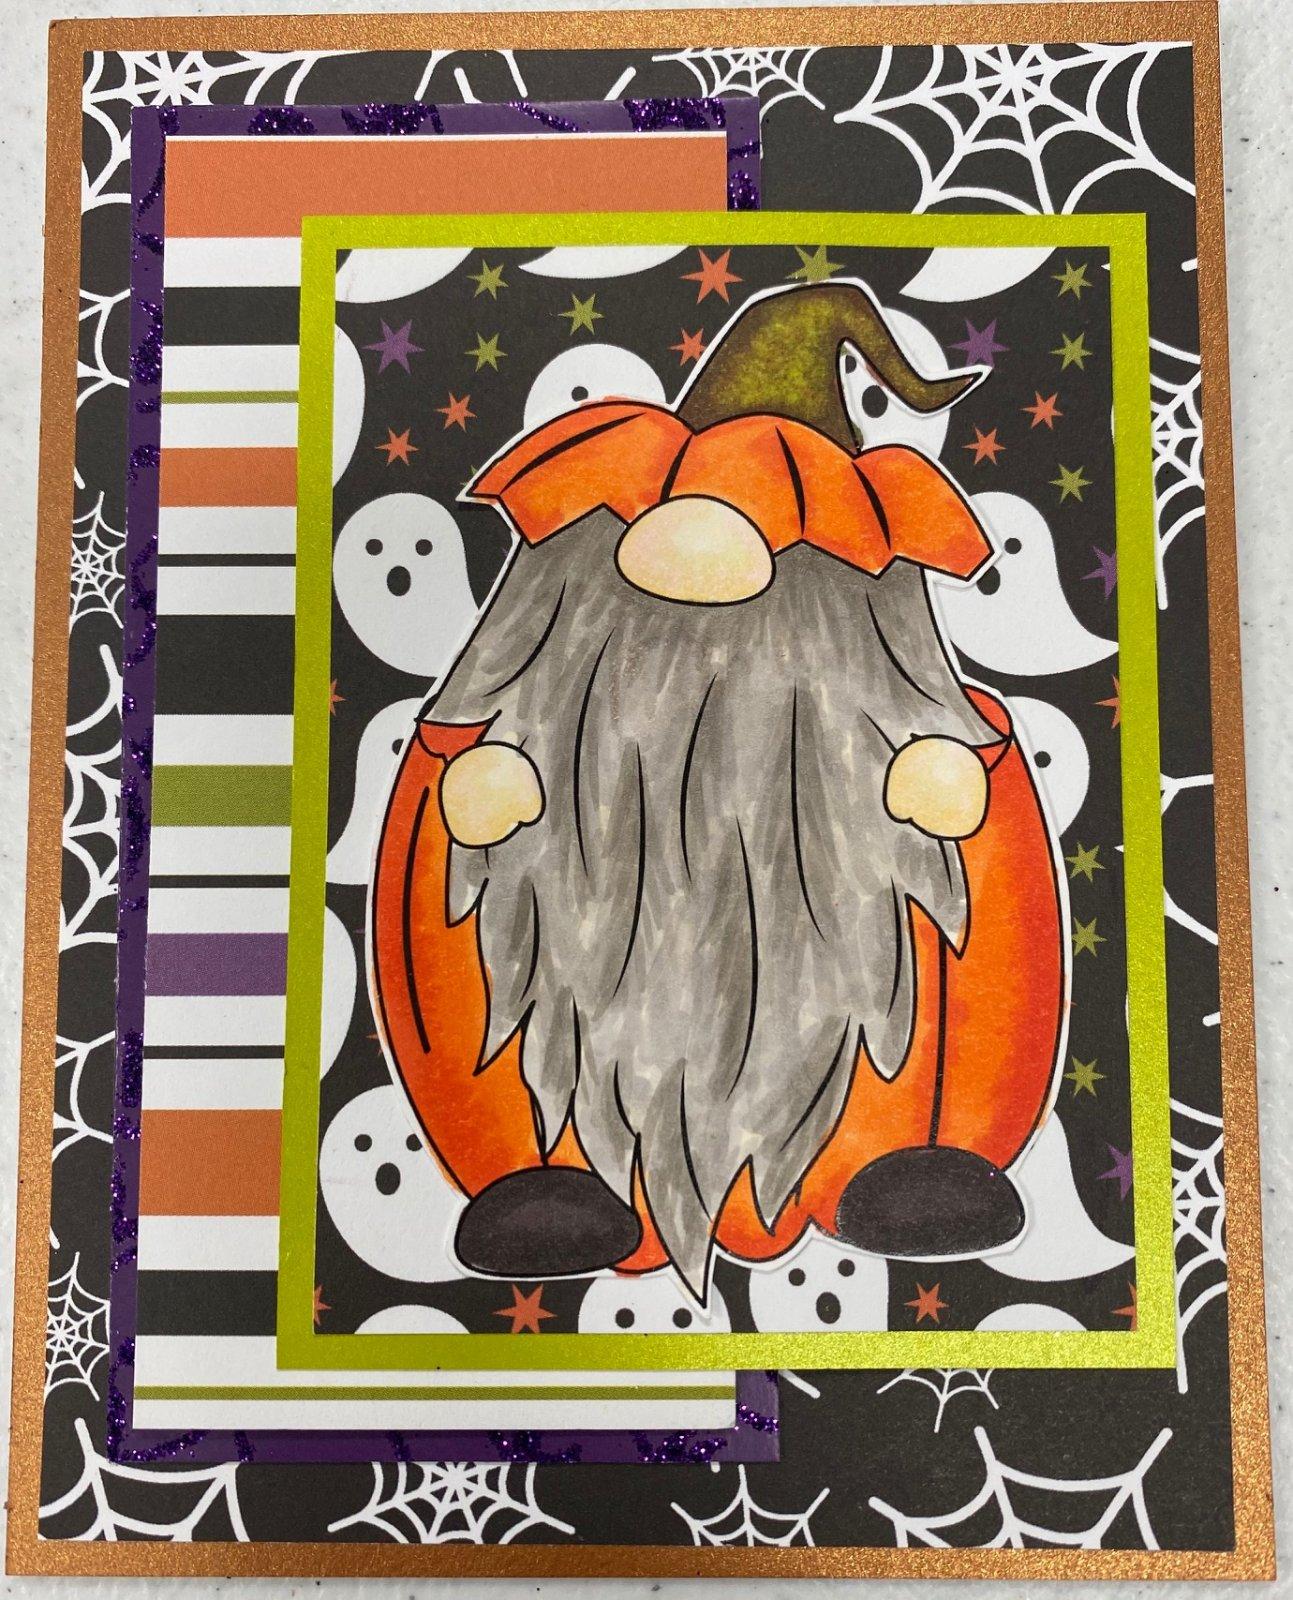 Gnome Halloween Card Kit